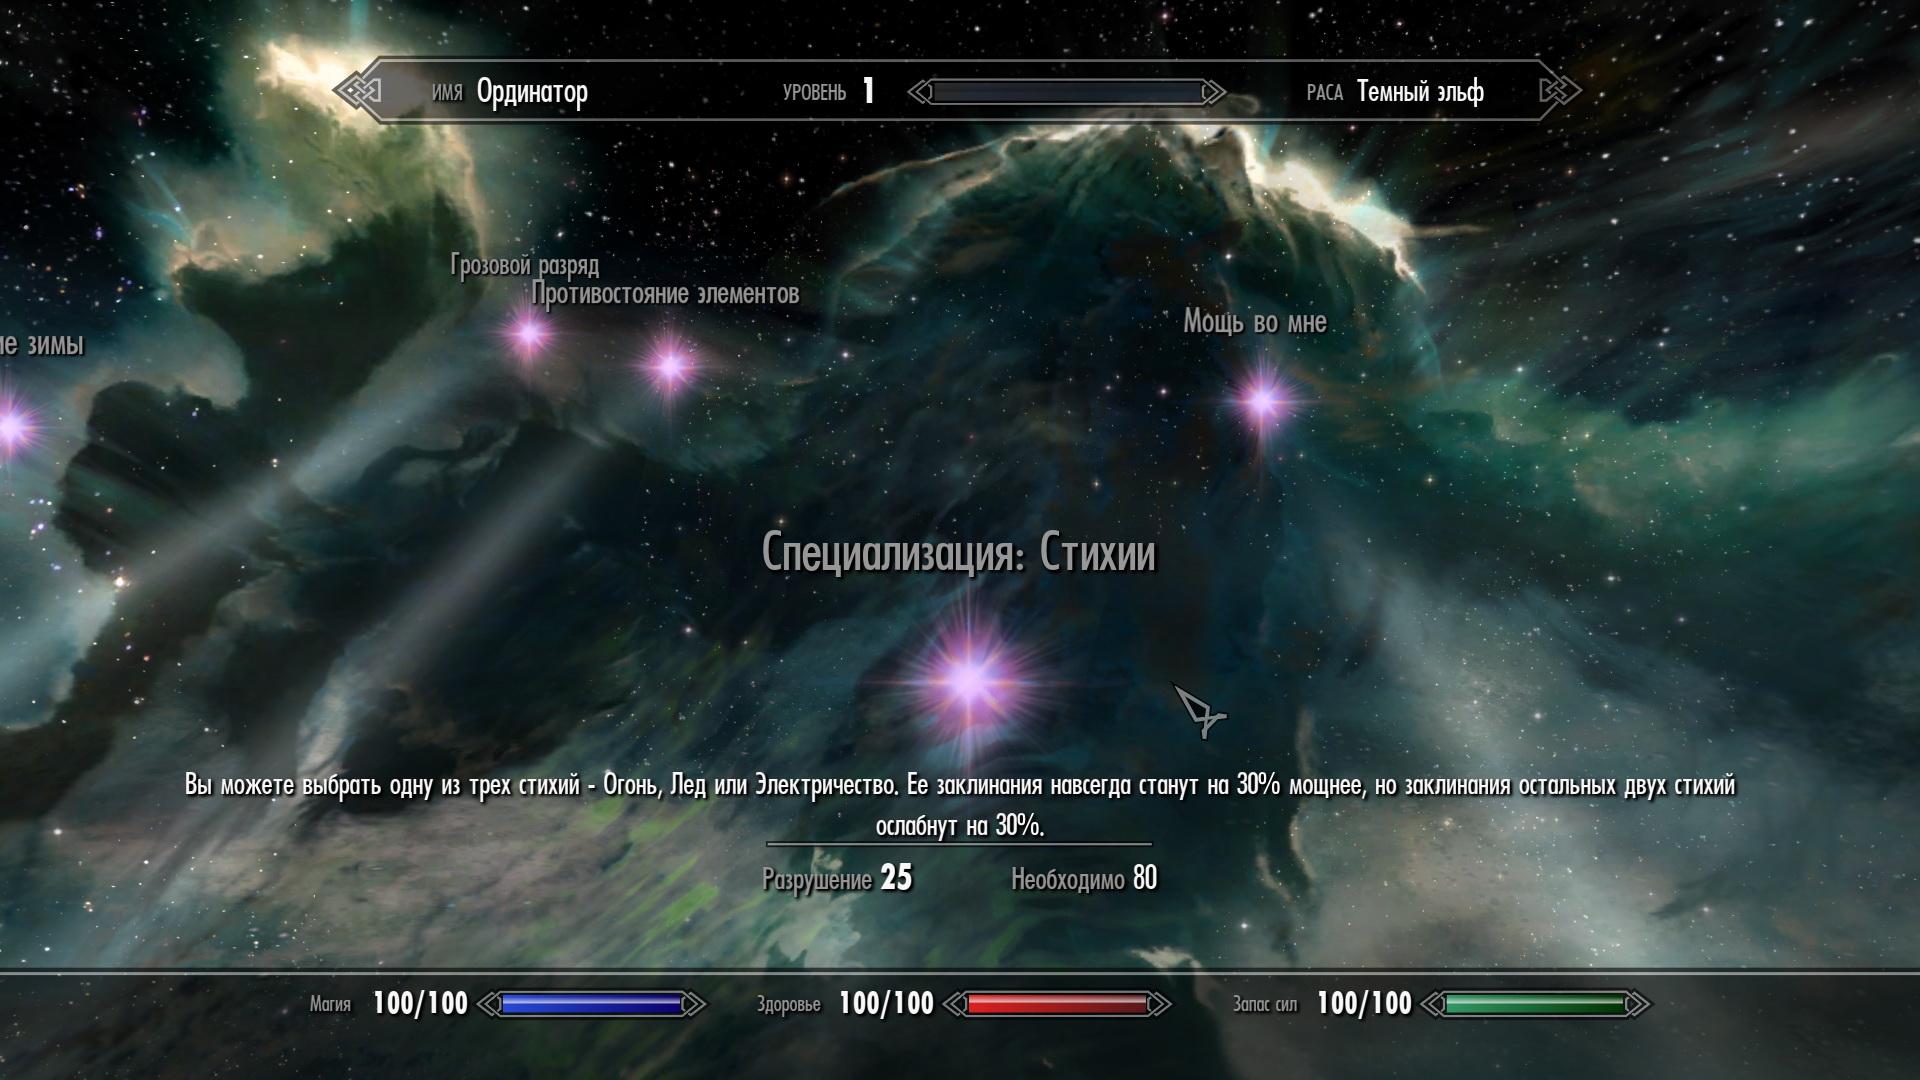 Ordinator Skyrim Mod   Pics   Download  